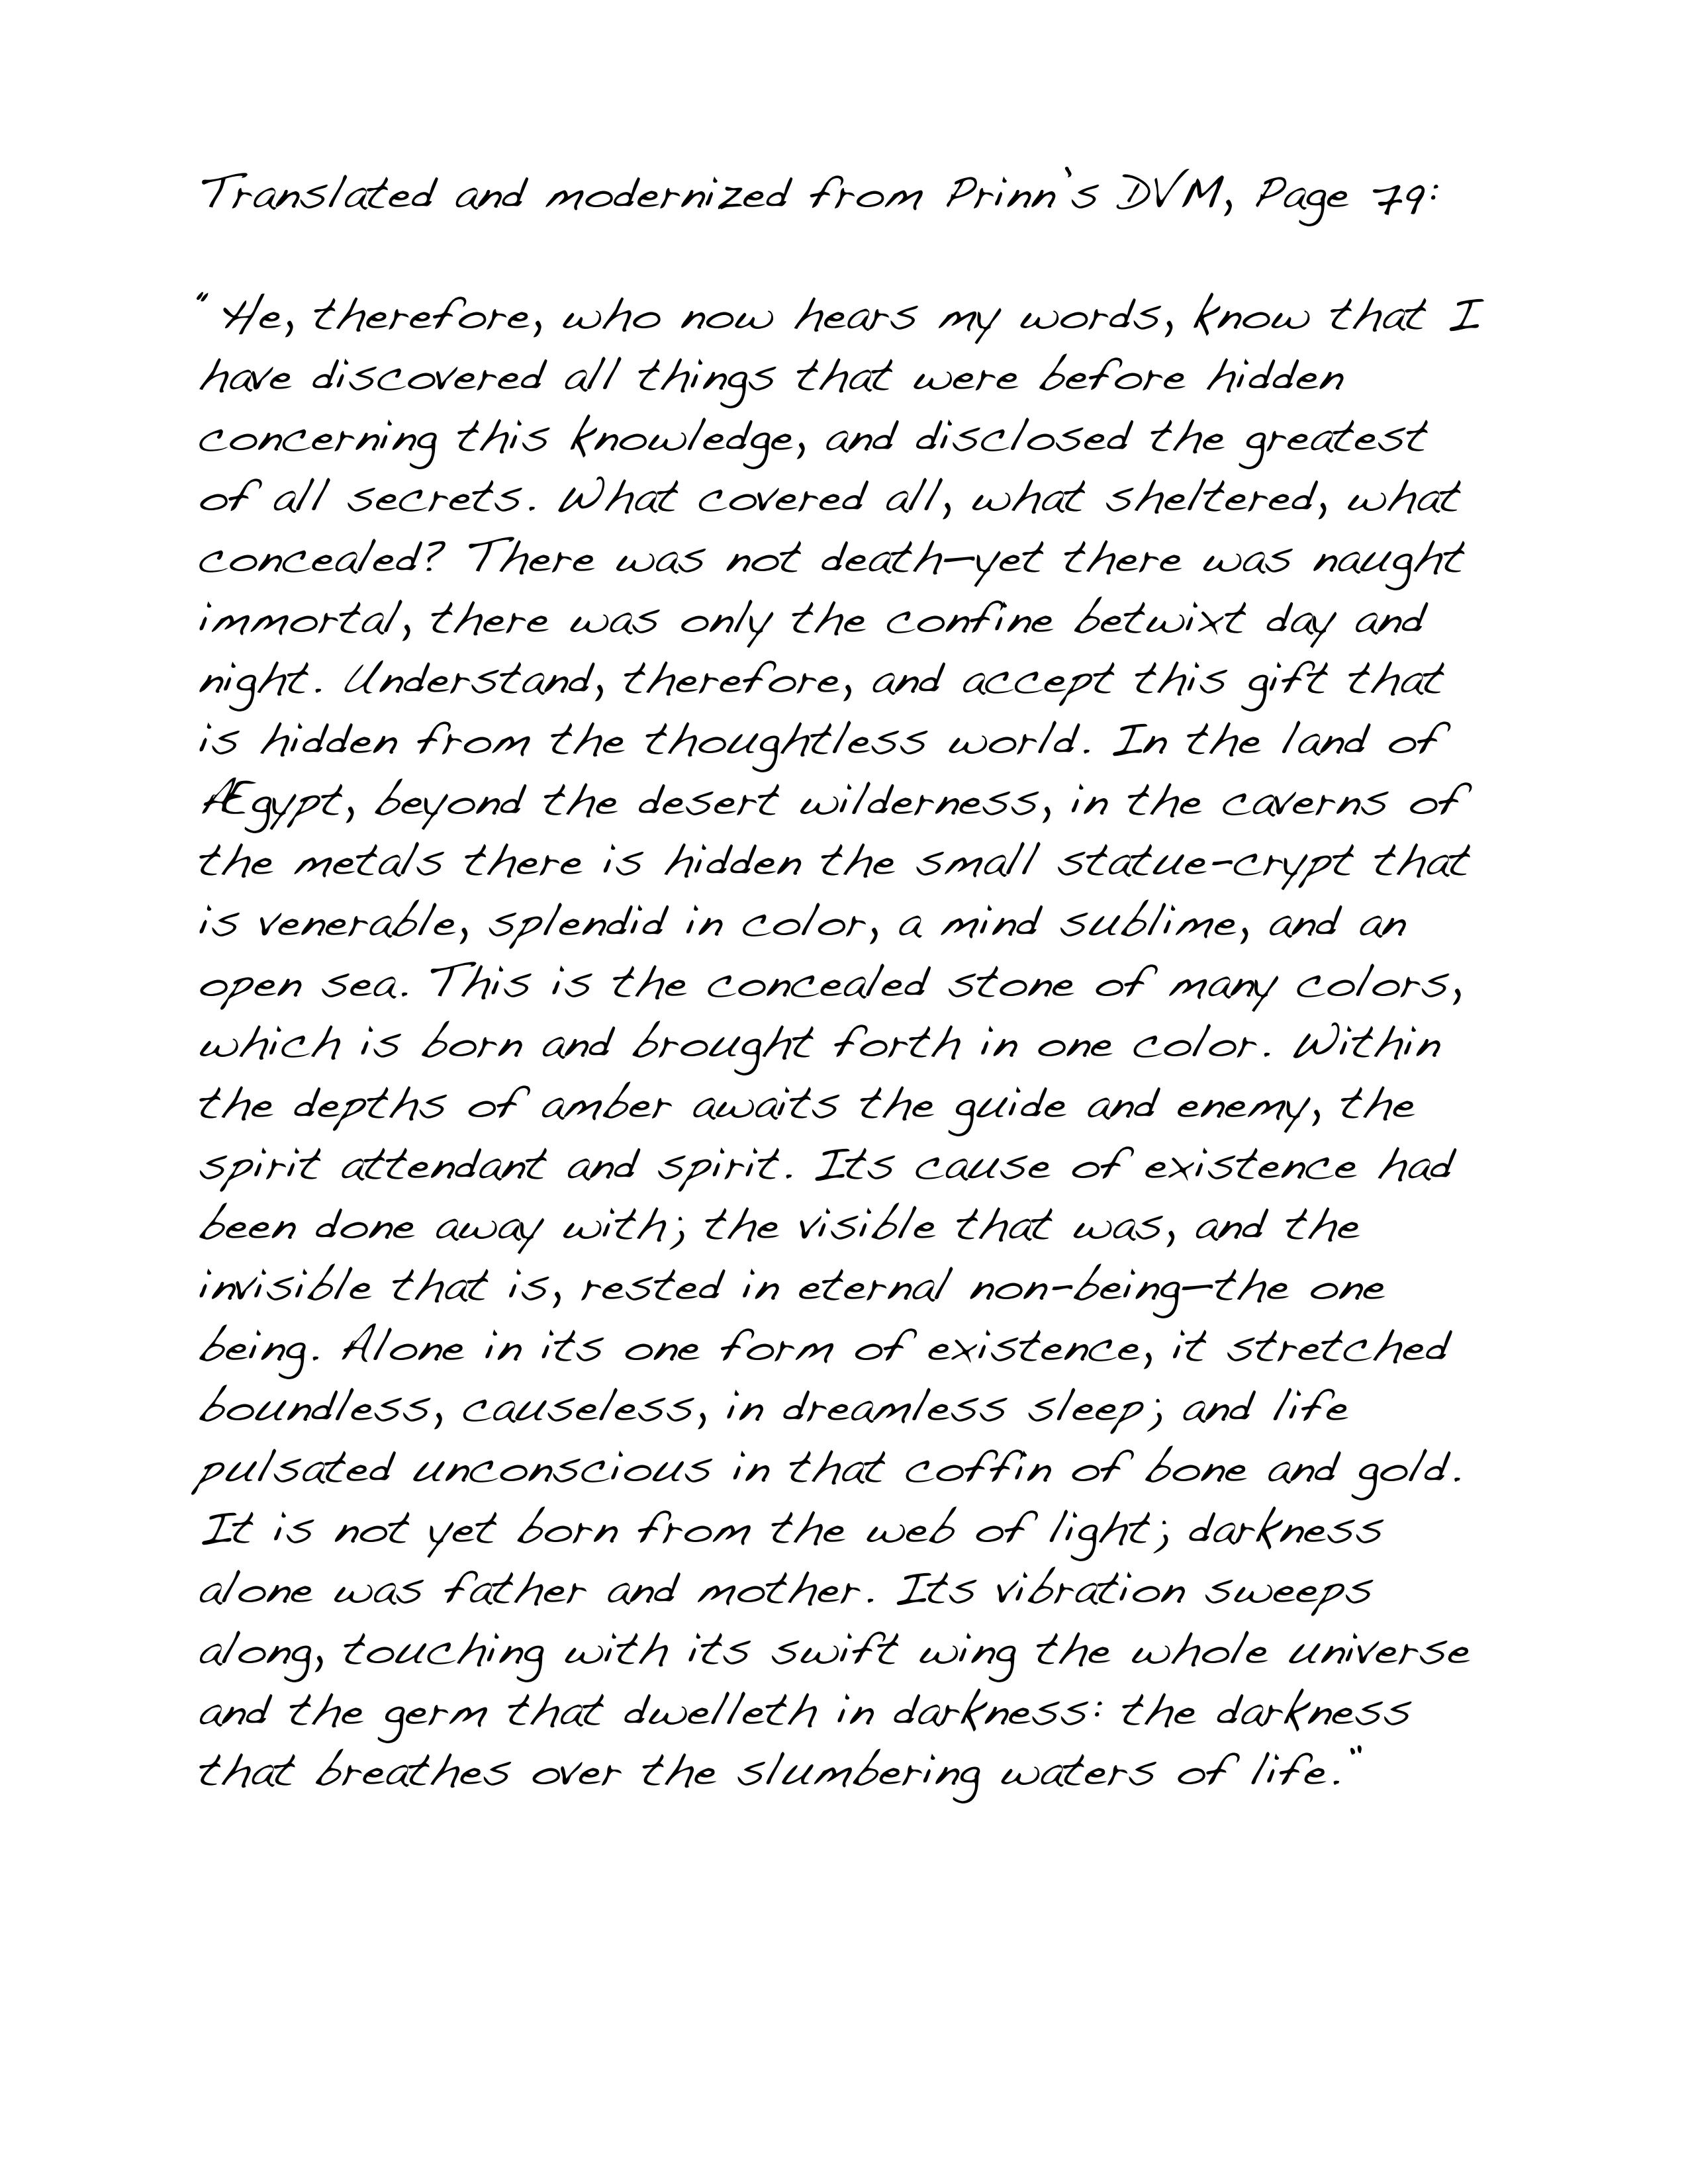 De vermis mysteriis page 3